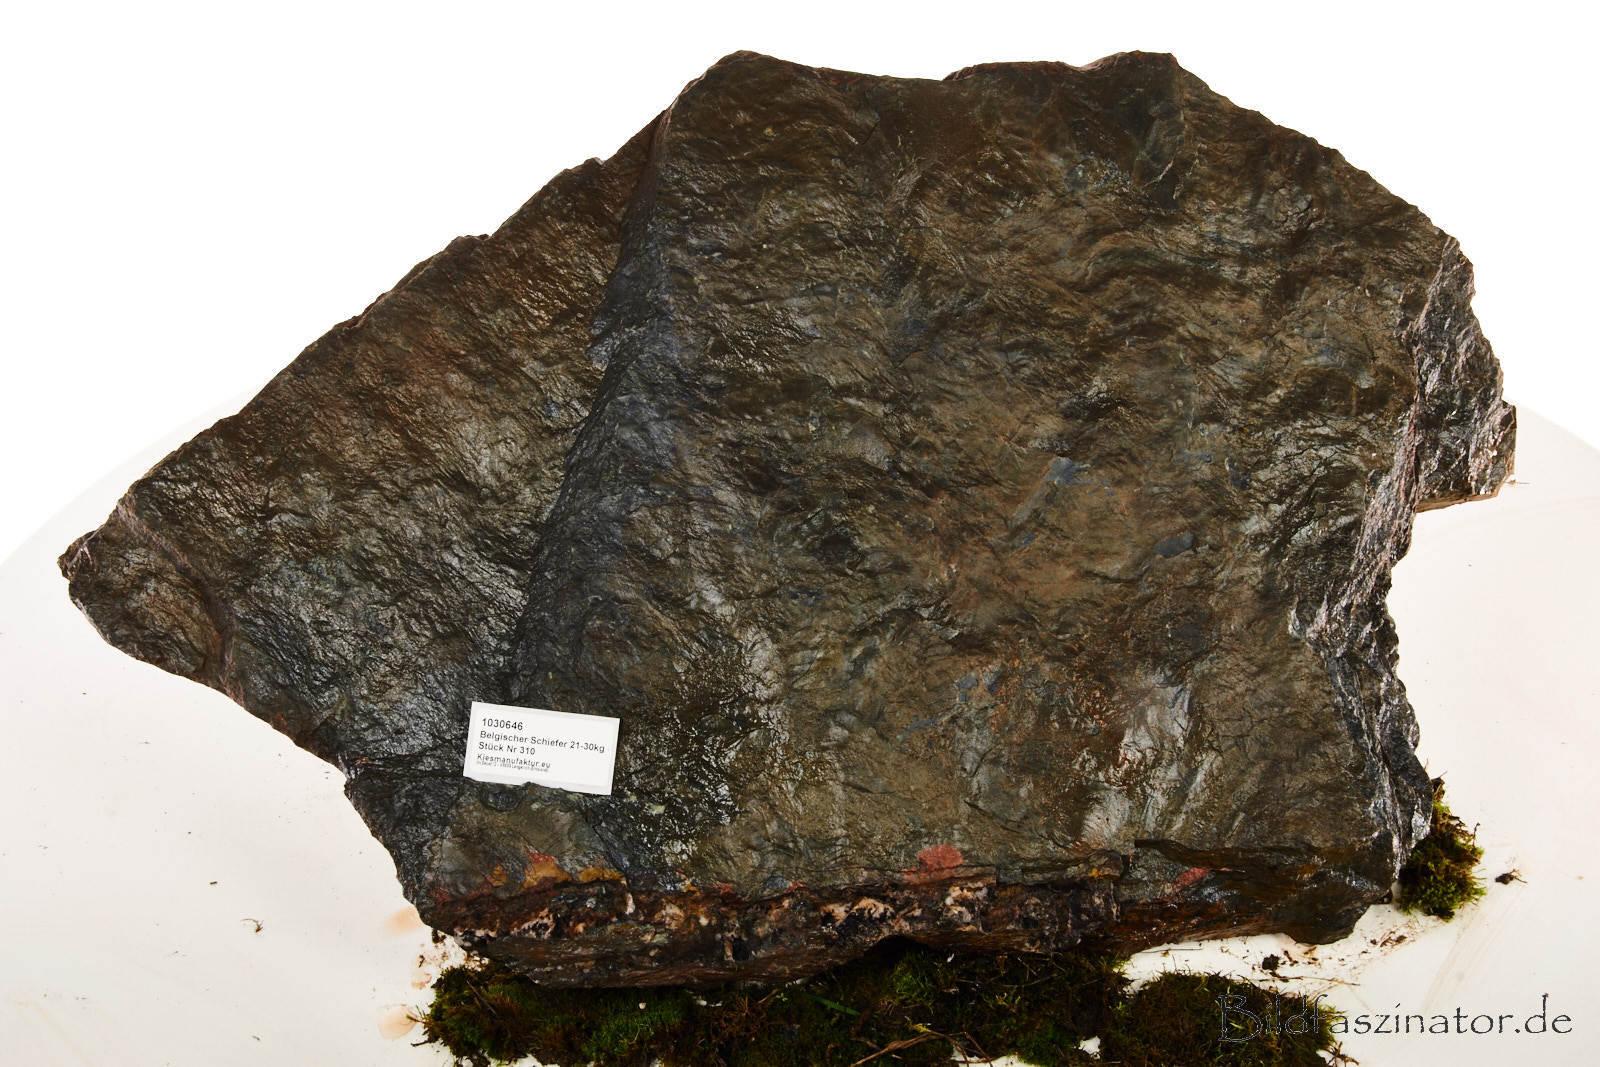 Belgischer S efer Stk310- 29kg- 69x45cm, Aquariumdeko, inkl 9kg Aquariumkies